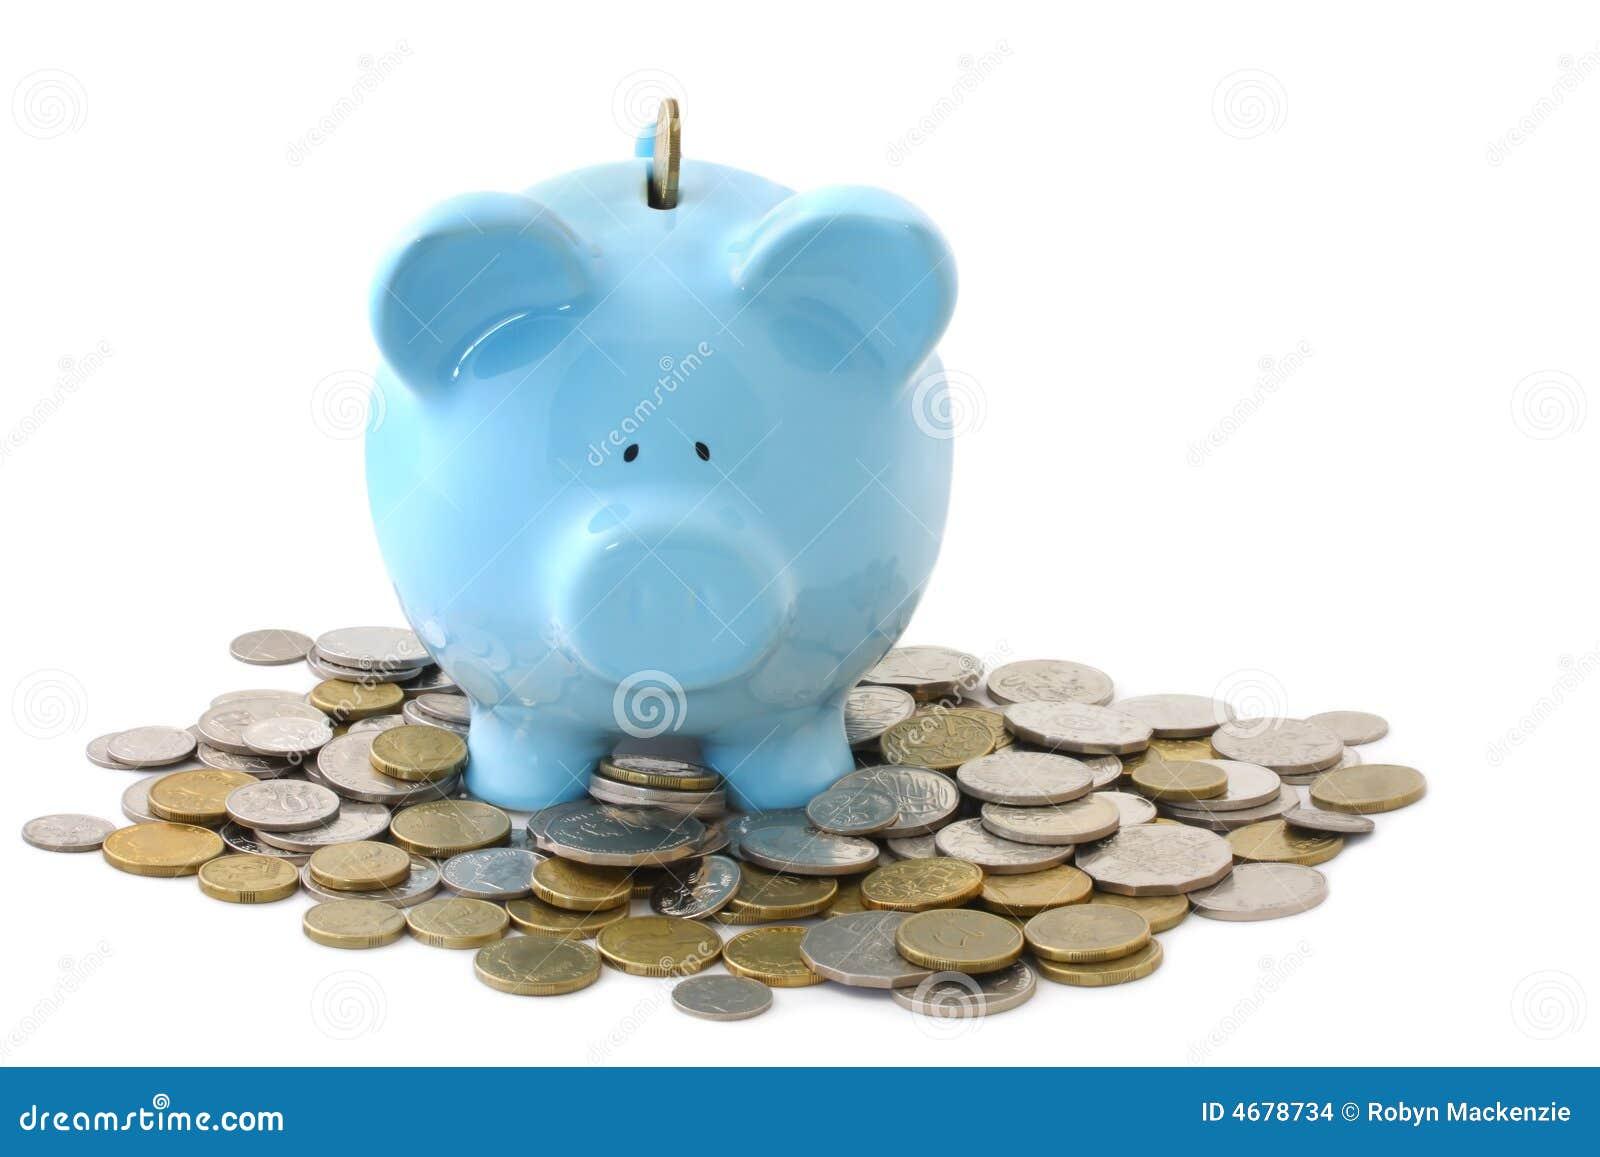 Overloaded Piggy Bank